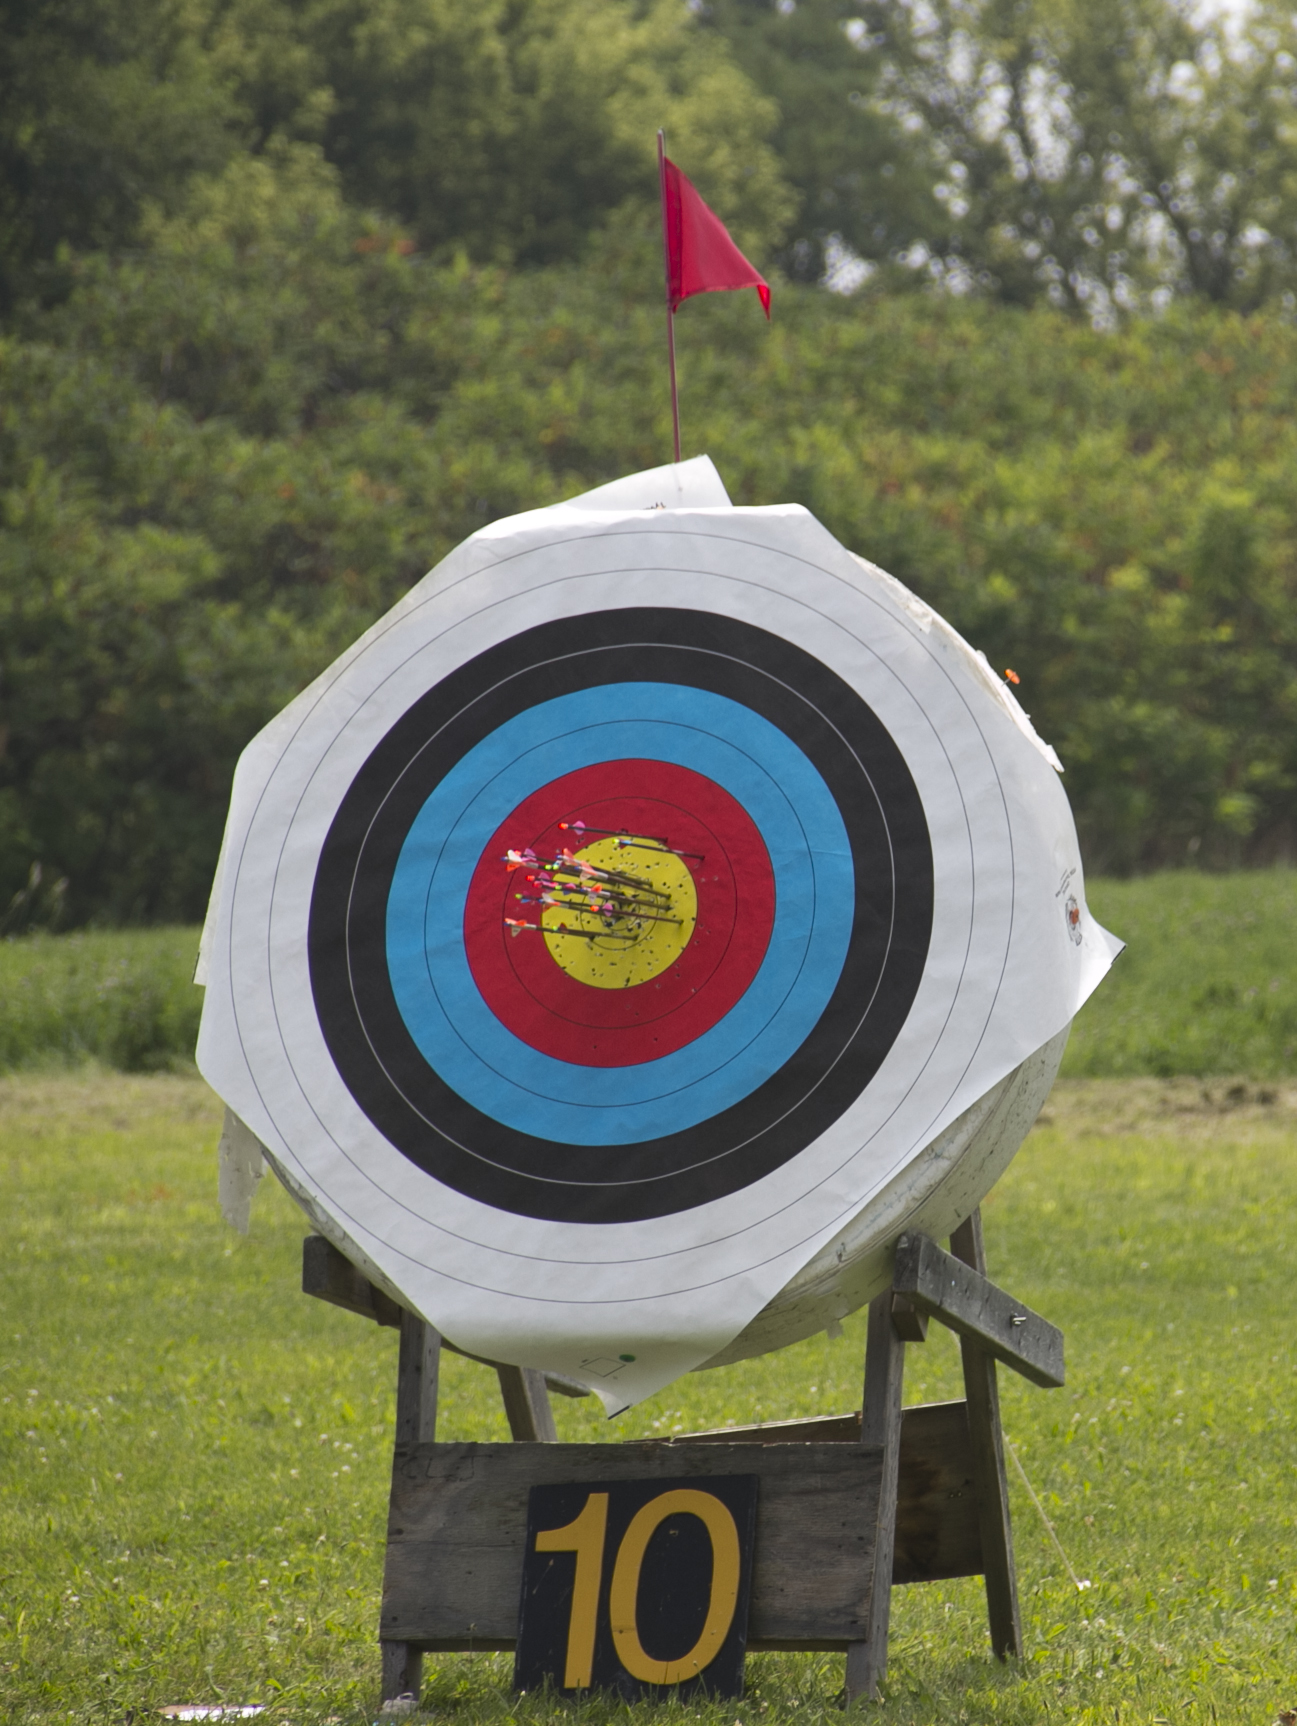 Nice target!